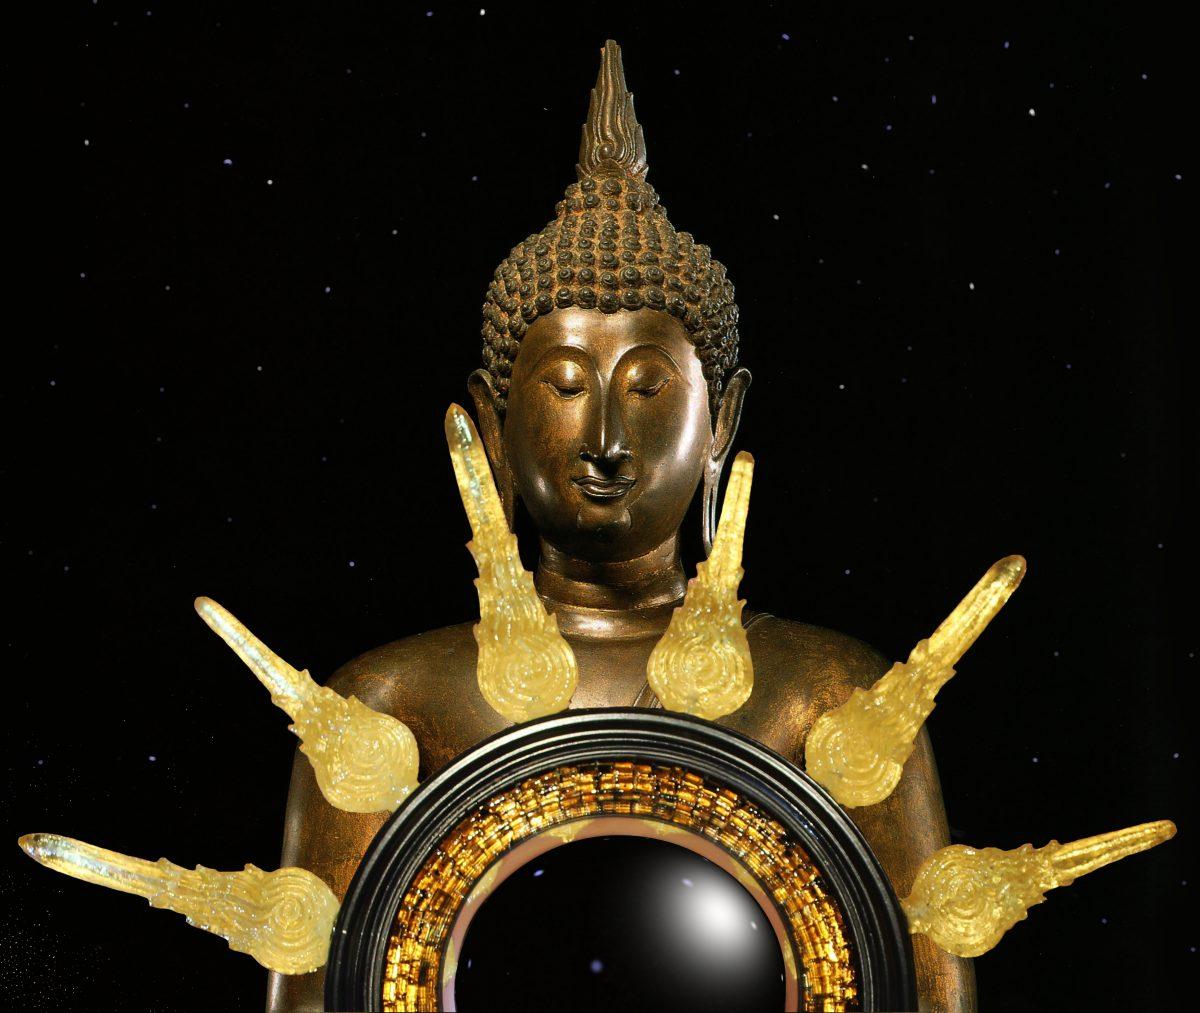 the Ushnisha Convex Mirror • The Art of Mark Evans